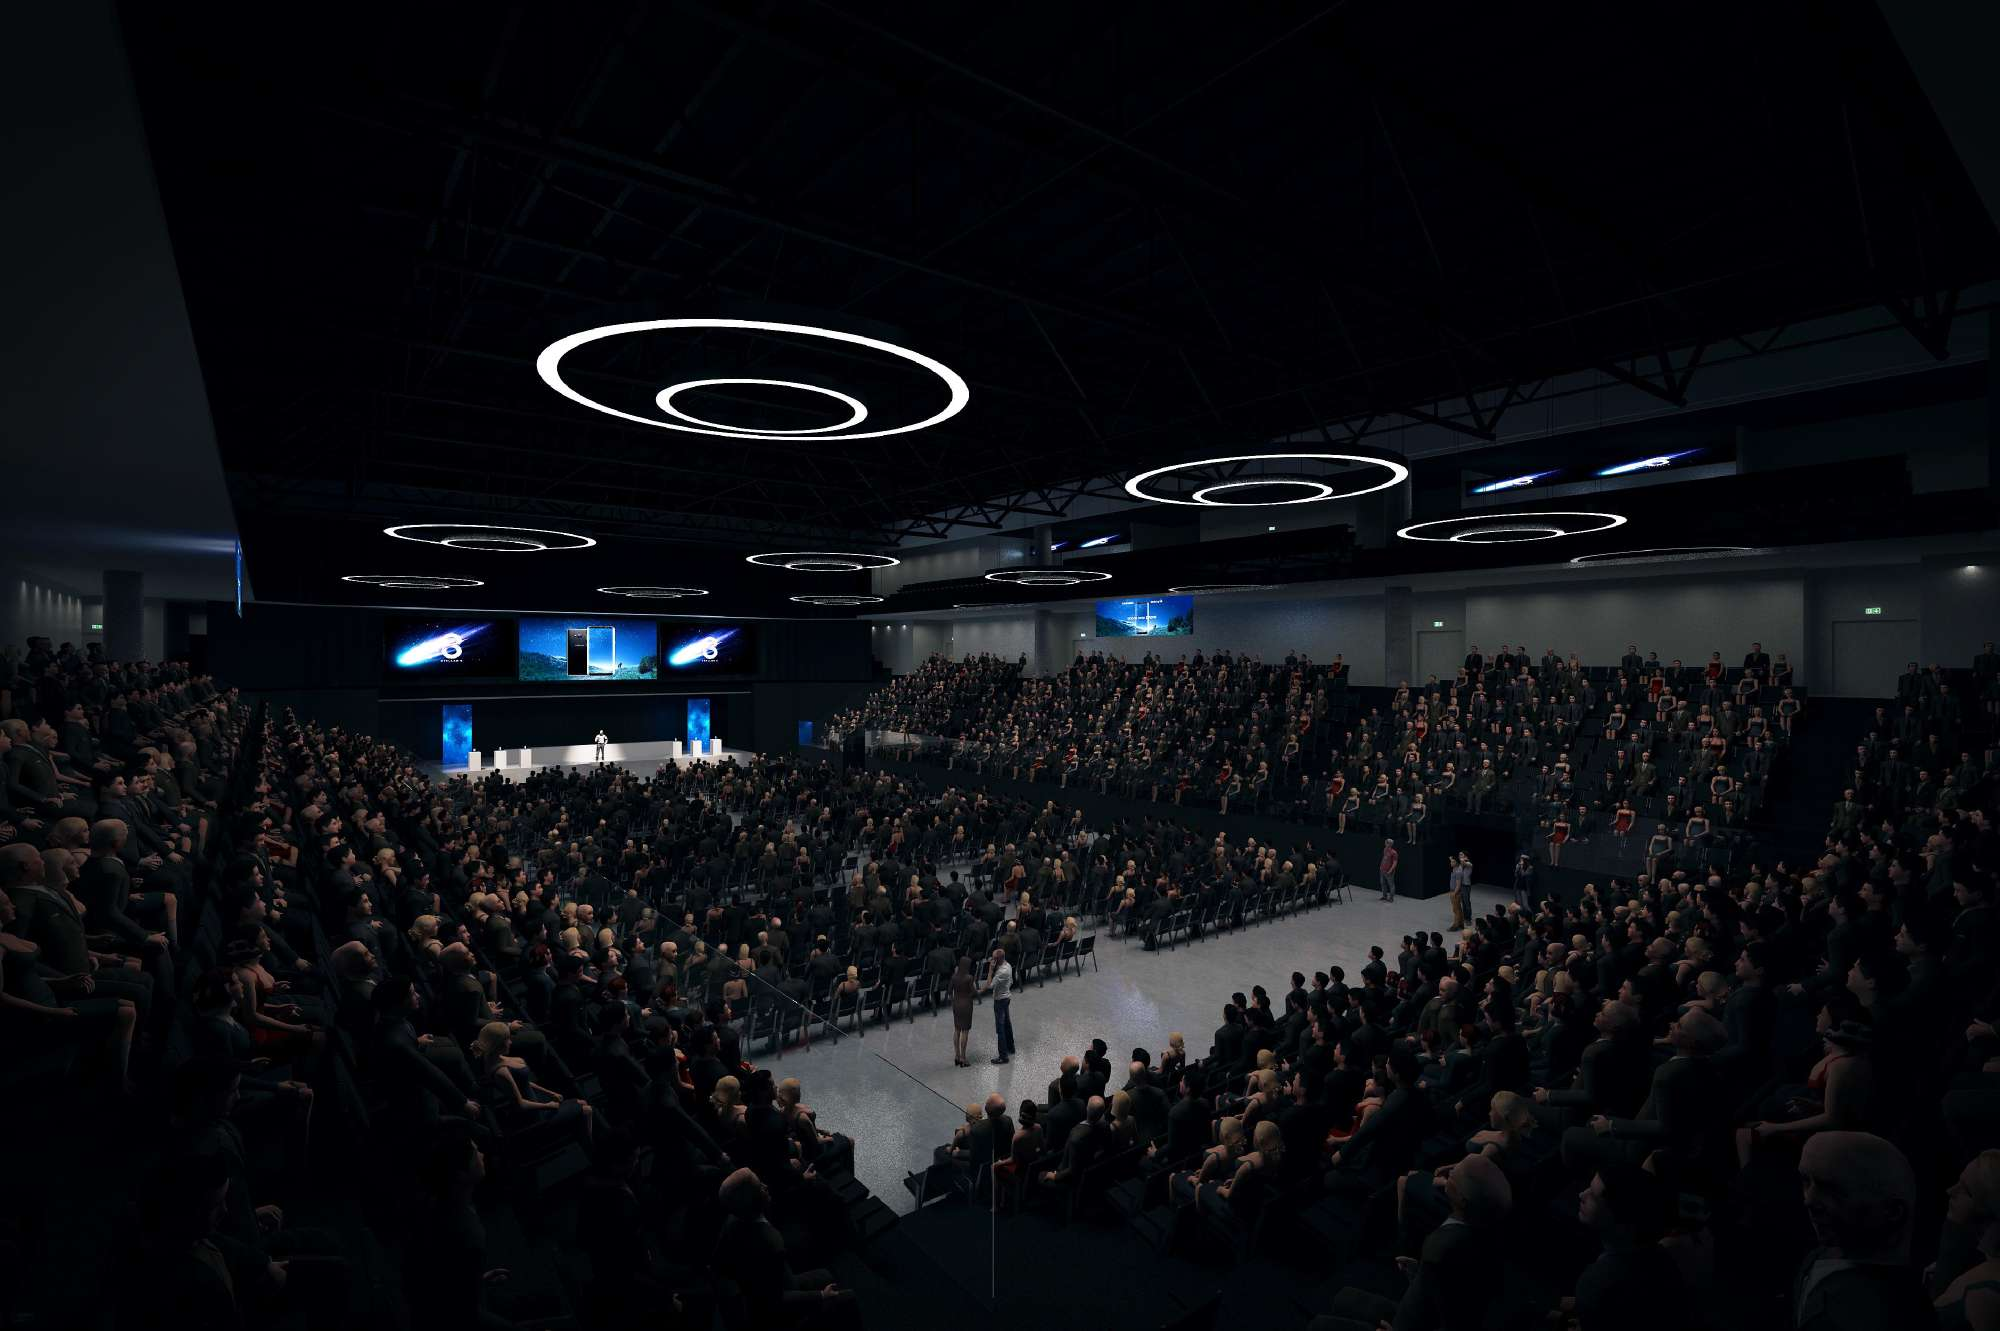 Praha - O2 arena - Kongresová aréna